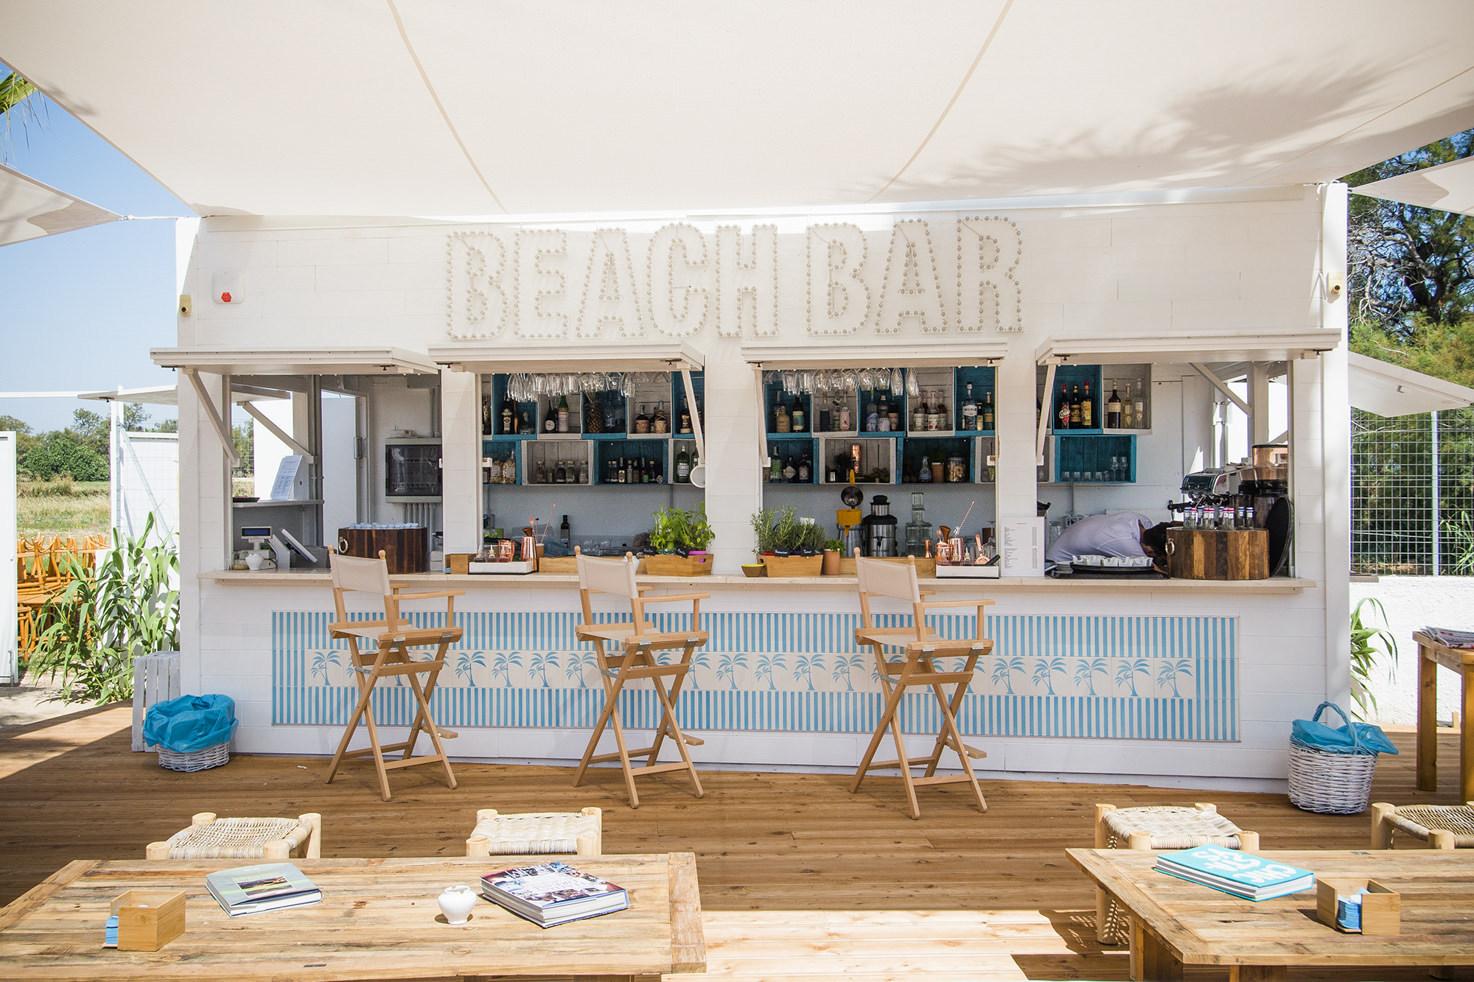 Torre Coccaro Beach bar